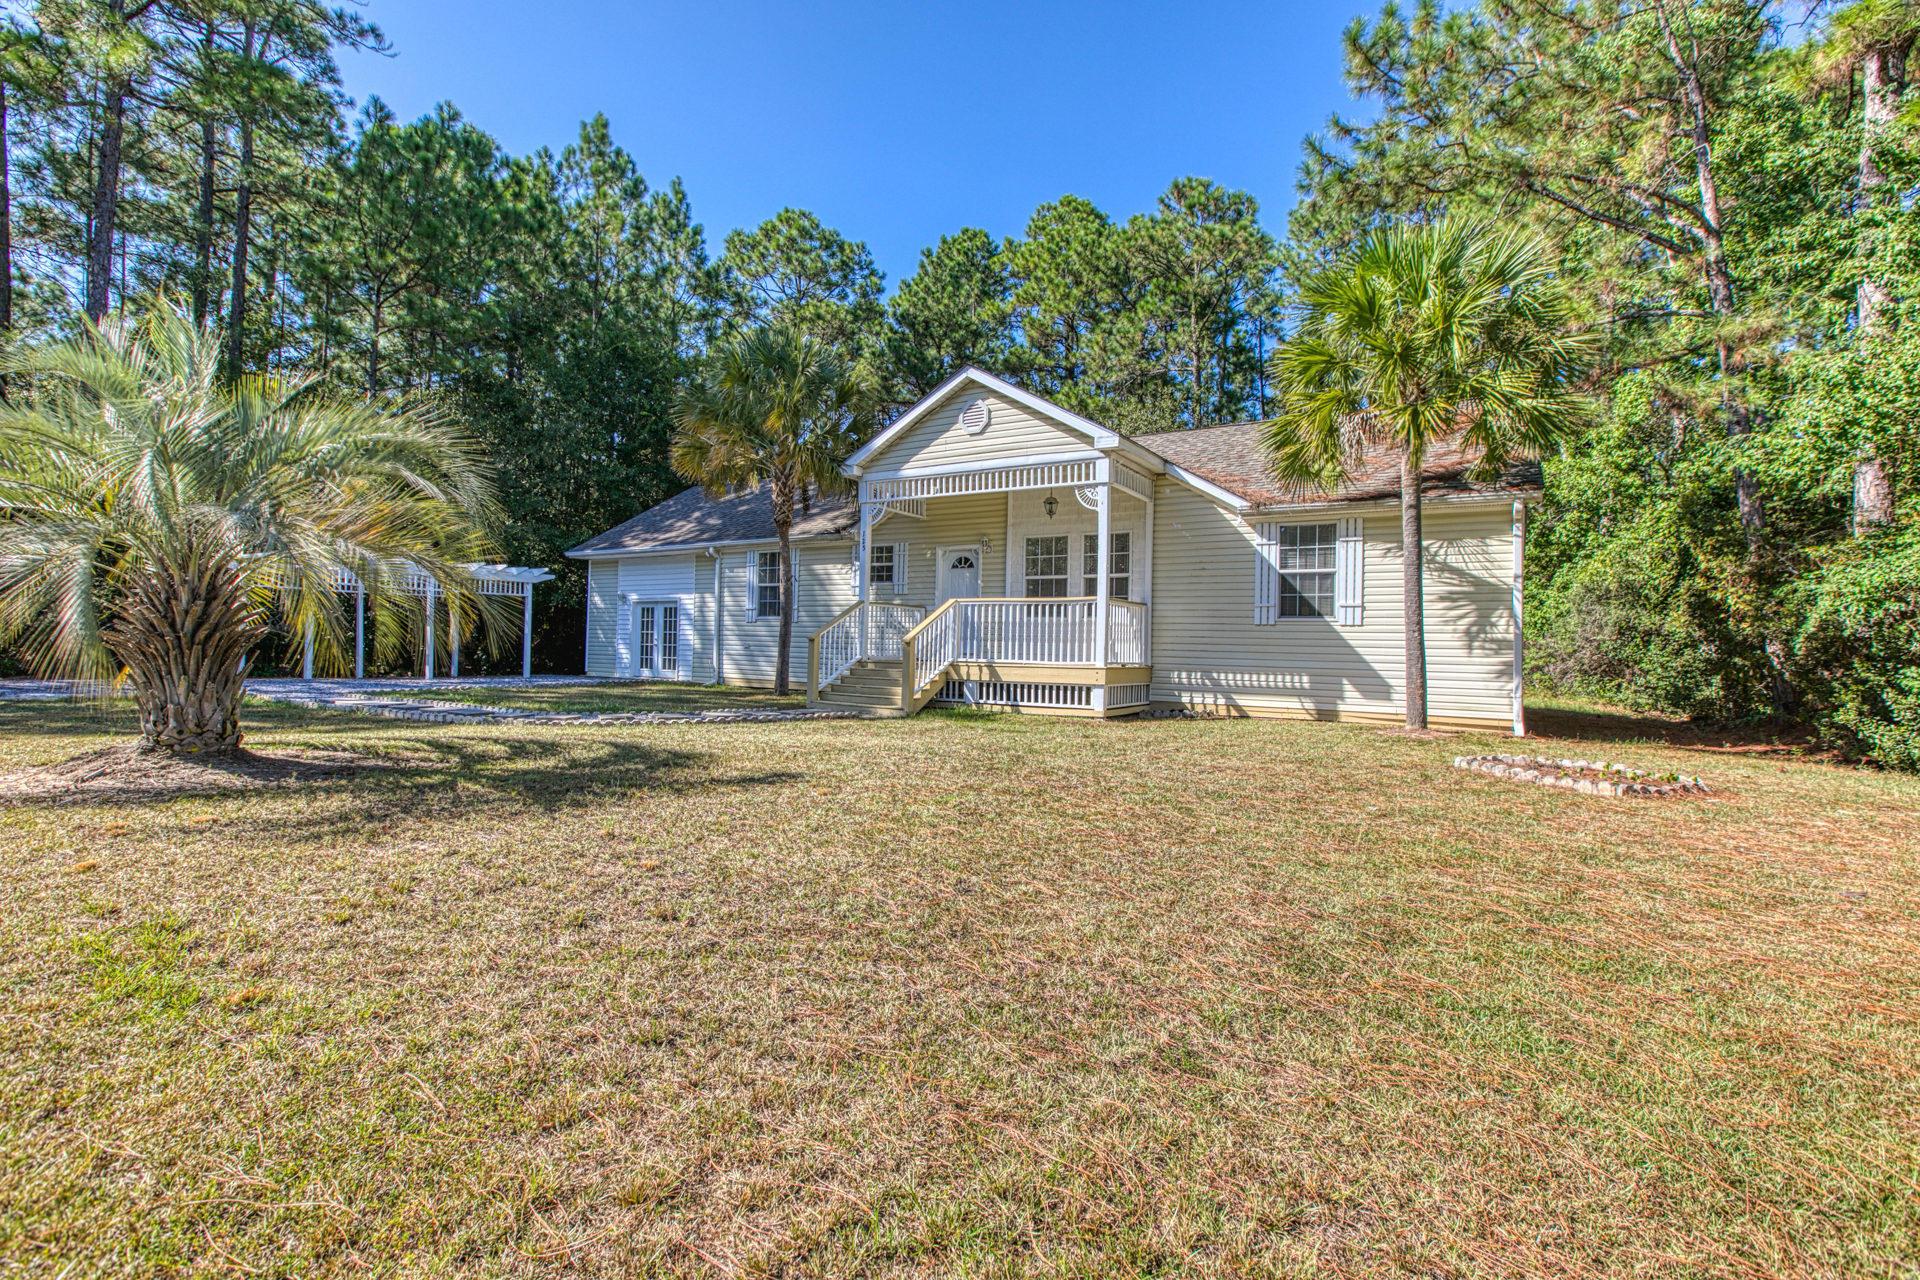 Photo of home for sale at 125 Markon, Santa Rosa Beach FL